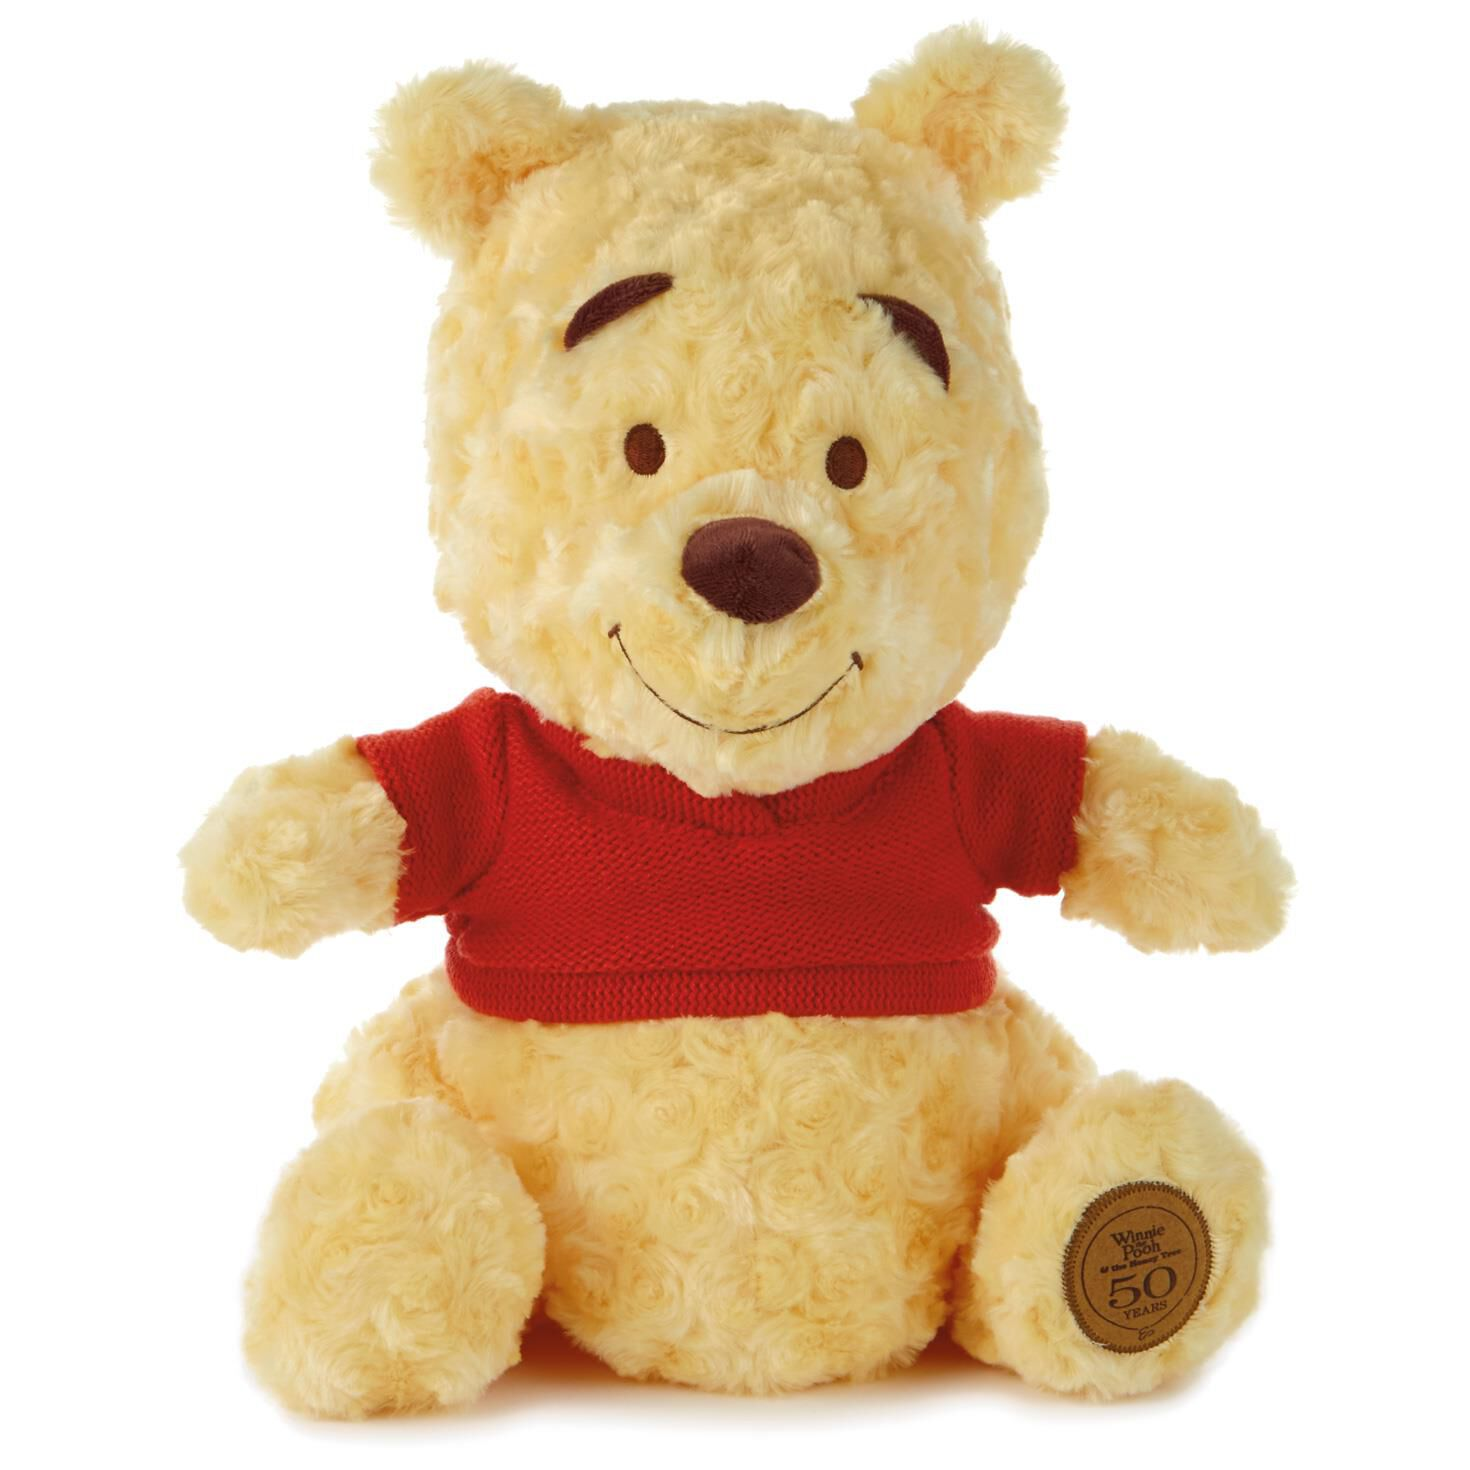 Winnie The Pooh 50th Anniversary Stuffed Animal Classic Stuffed